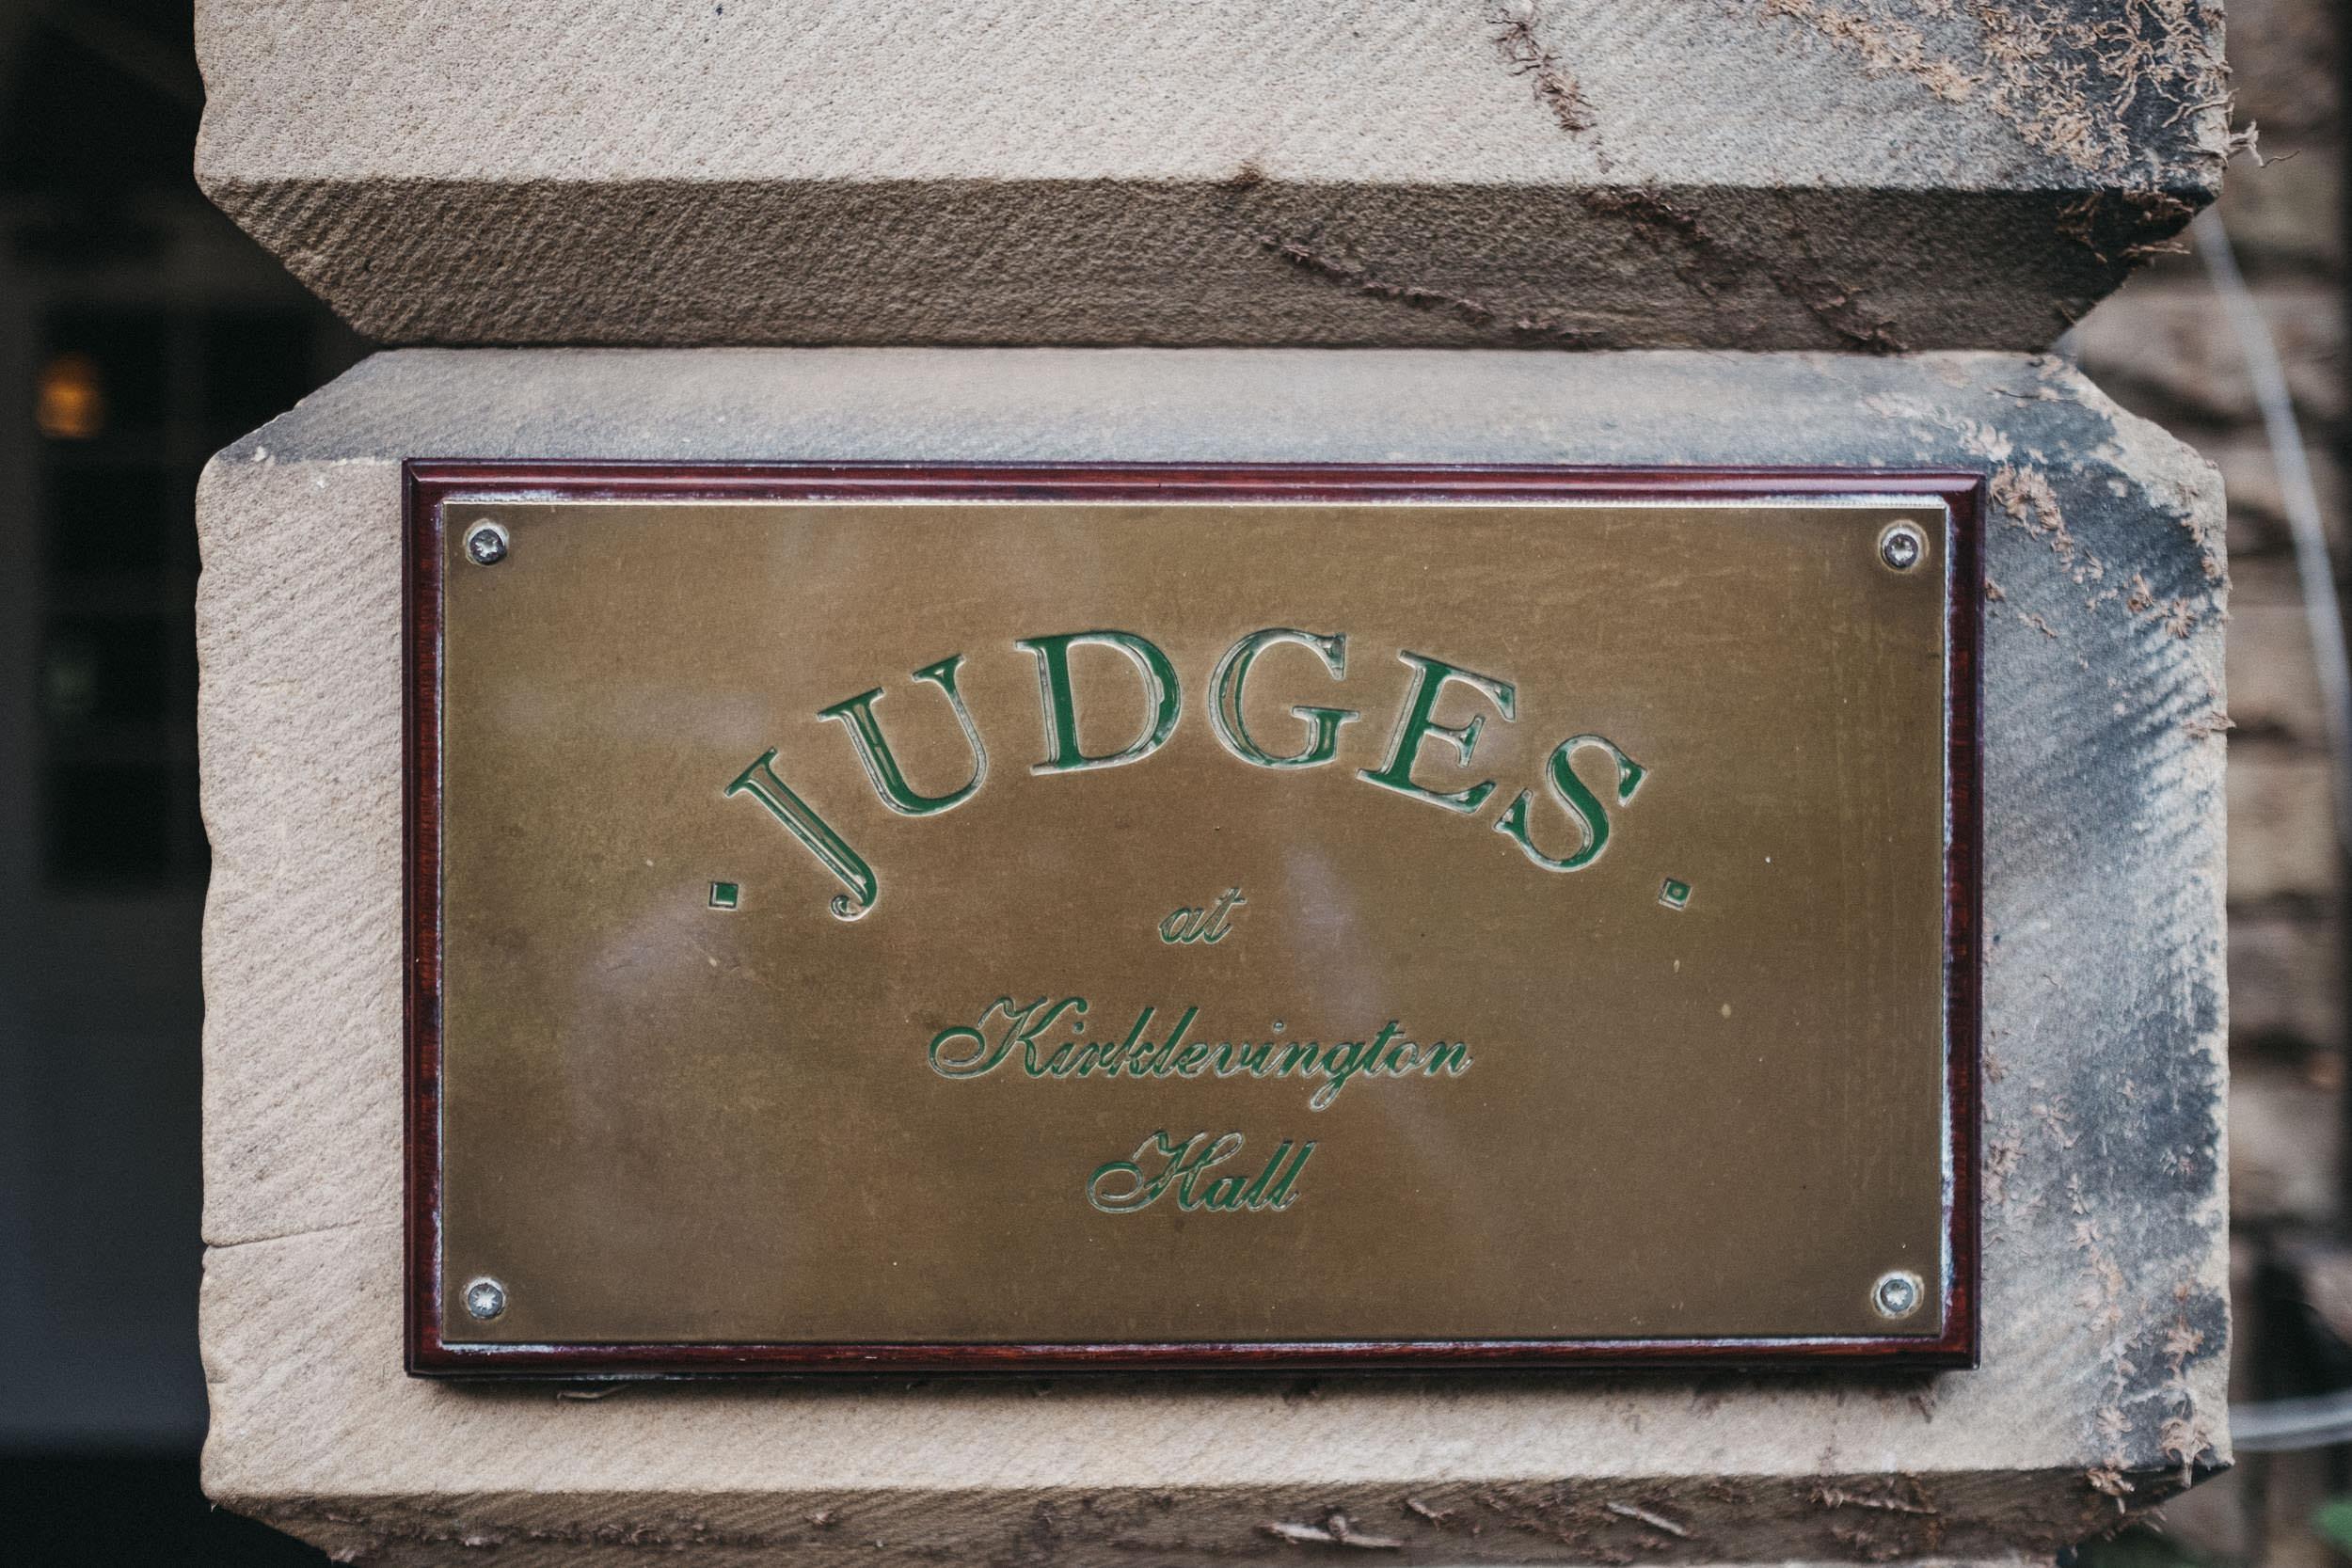 Brass sign of Judges at Kirklevington